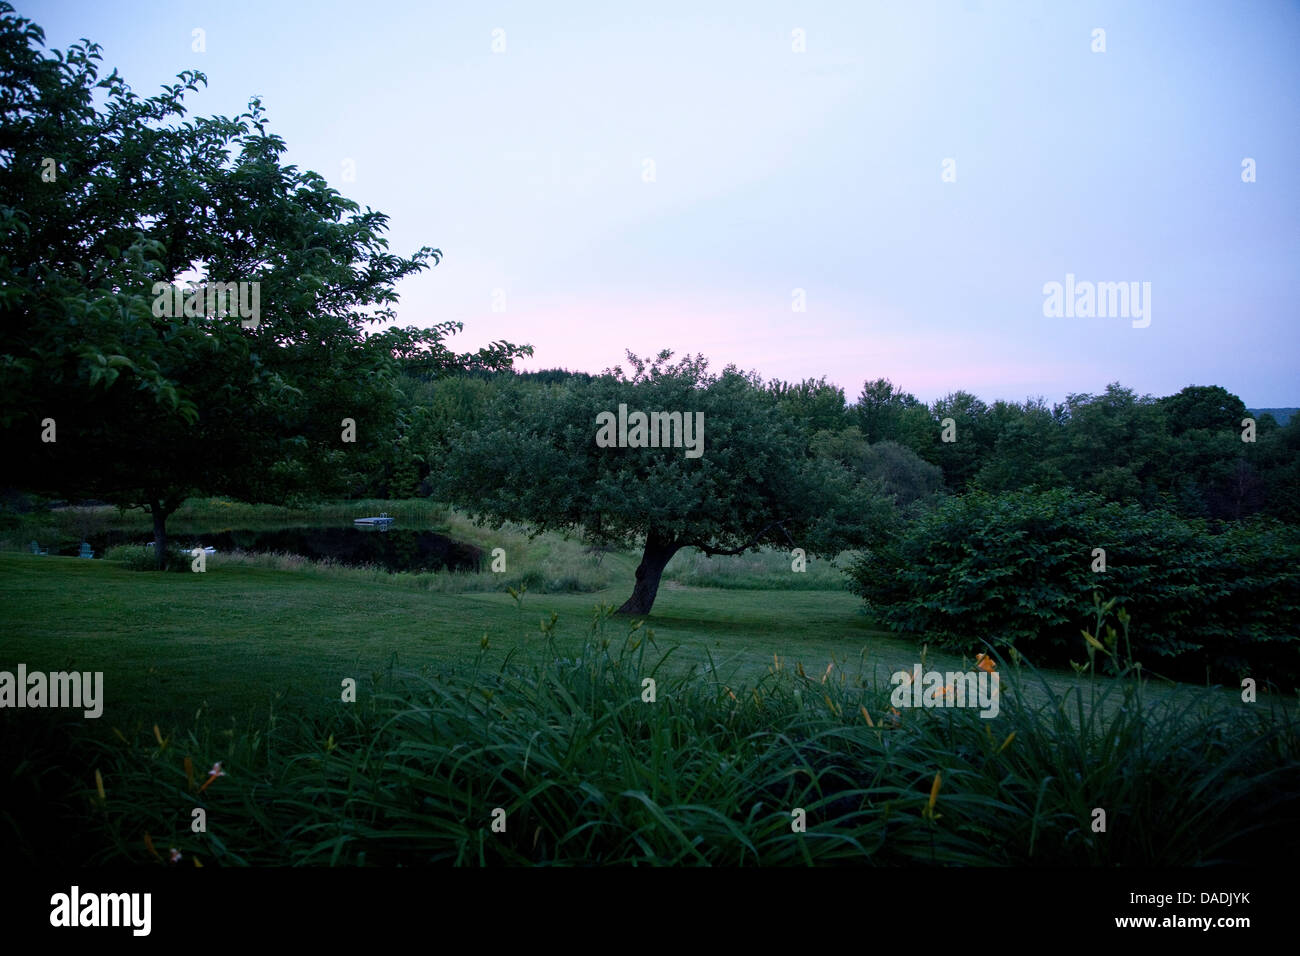 Lush green park at dusk - Stock Image